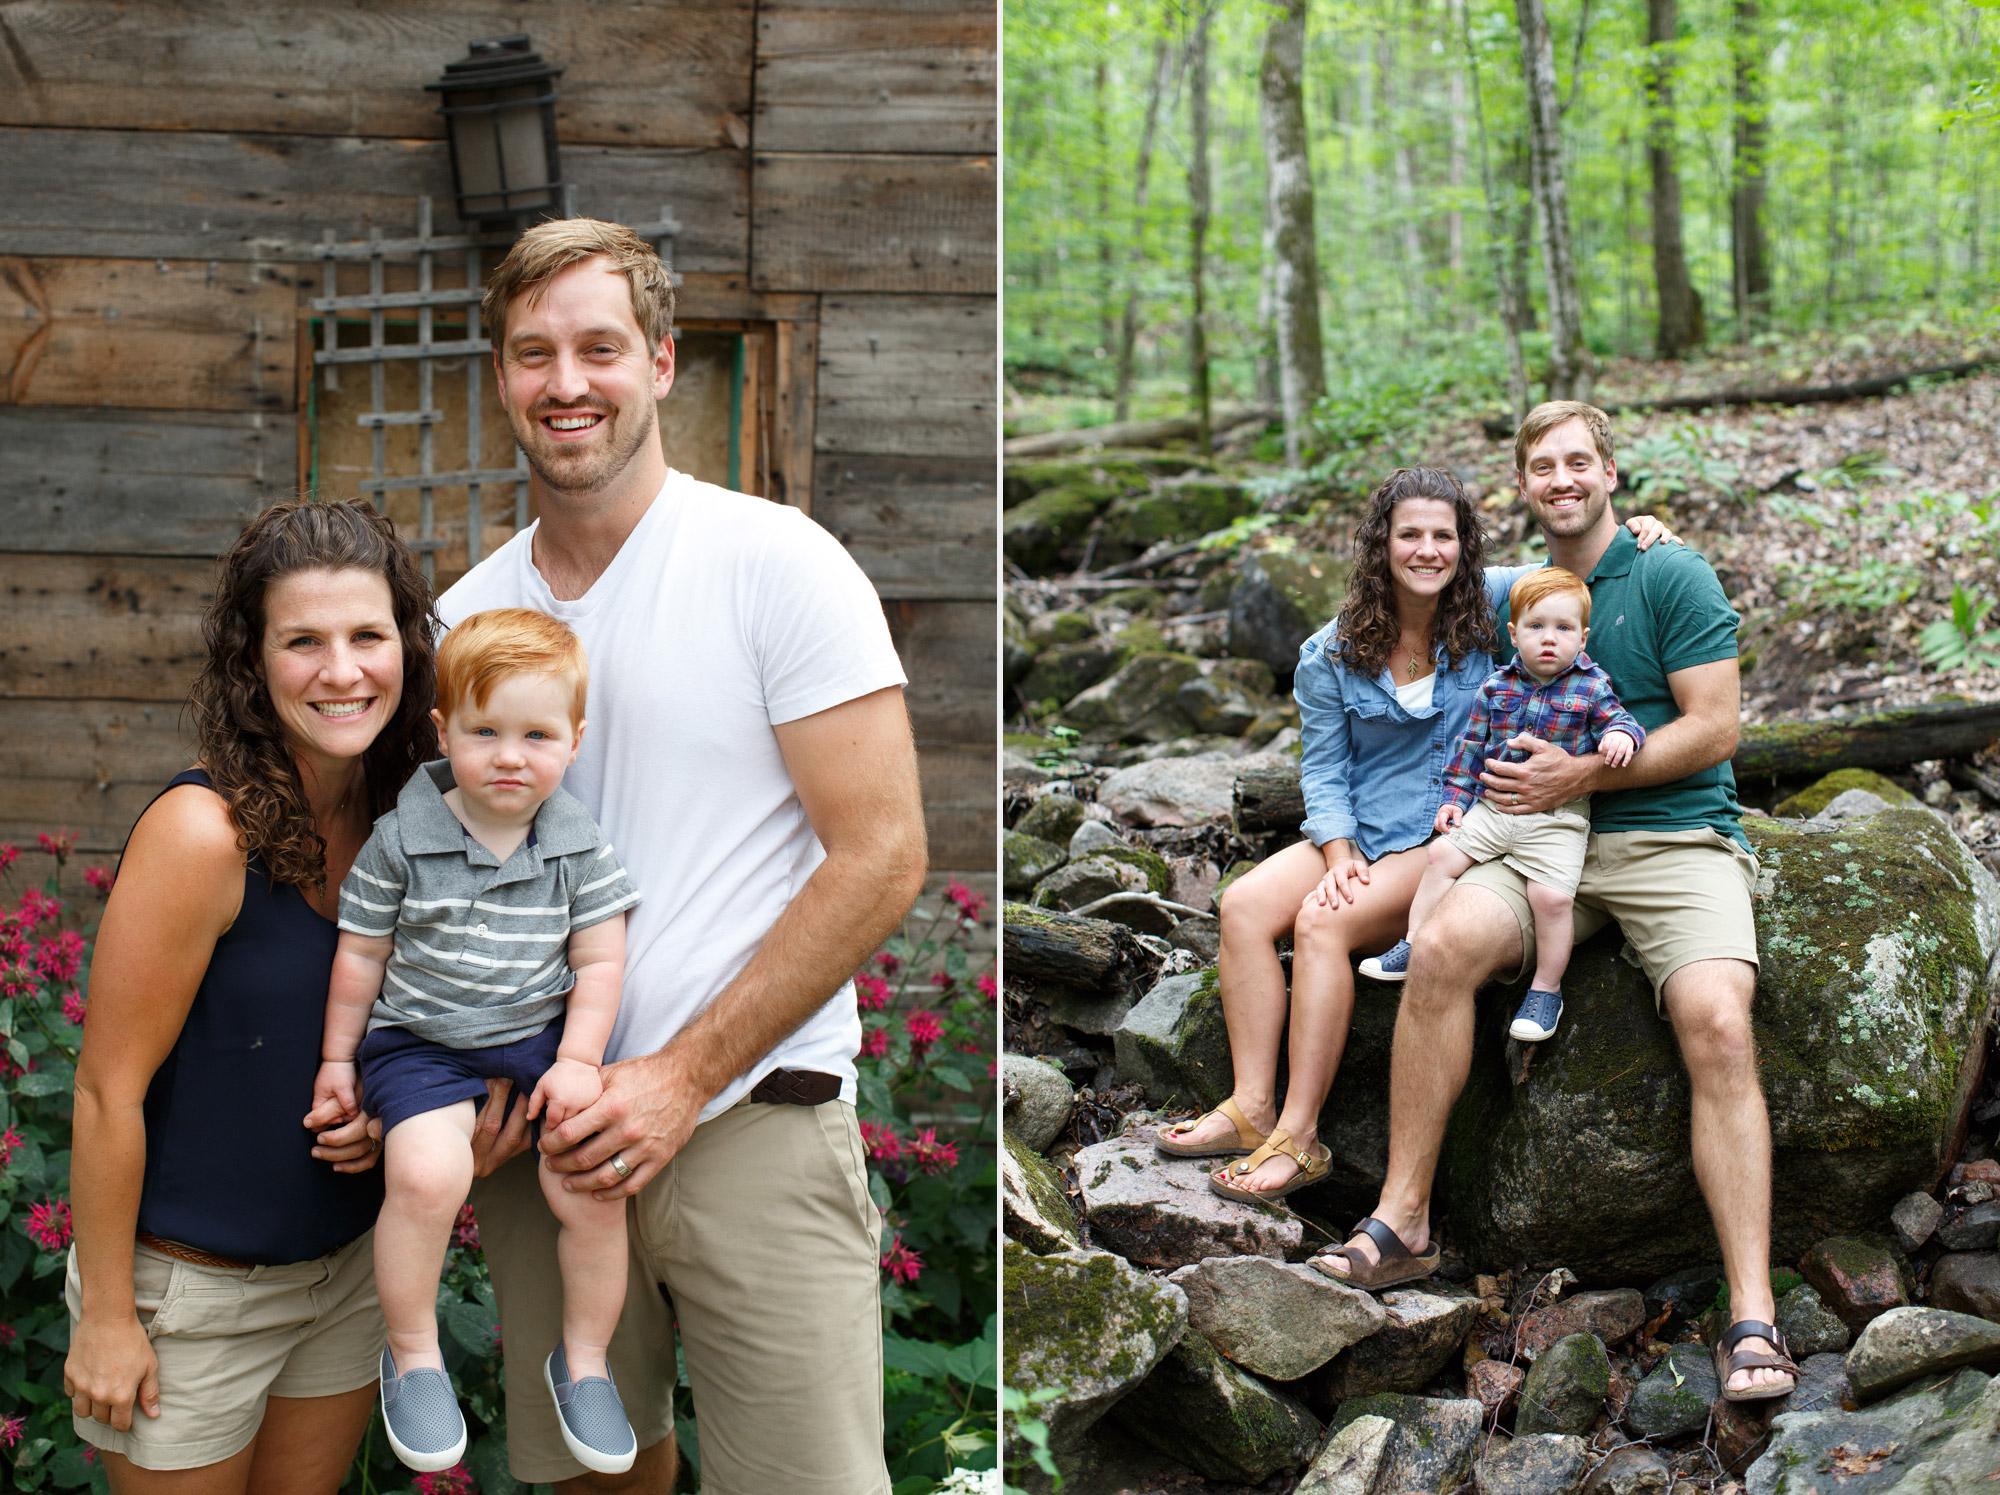 outdoor family photo ideas boyophoto